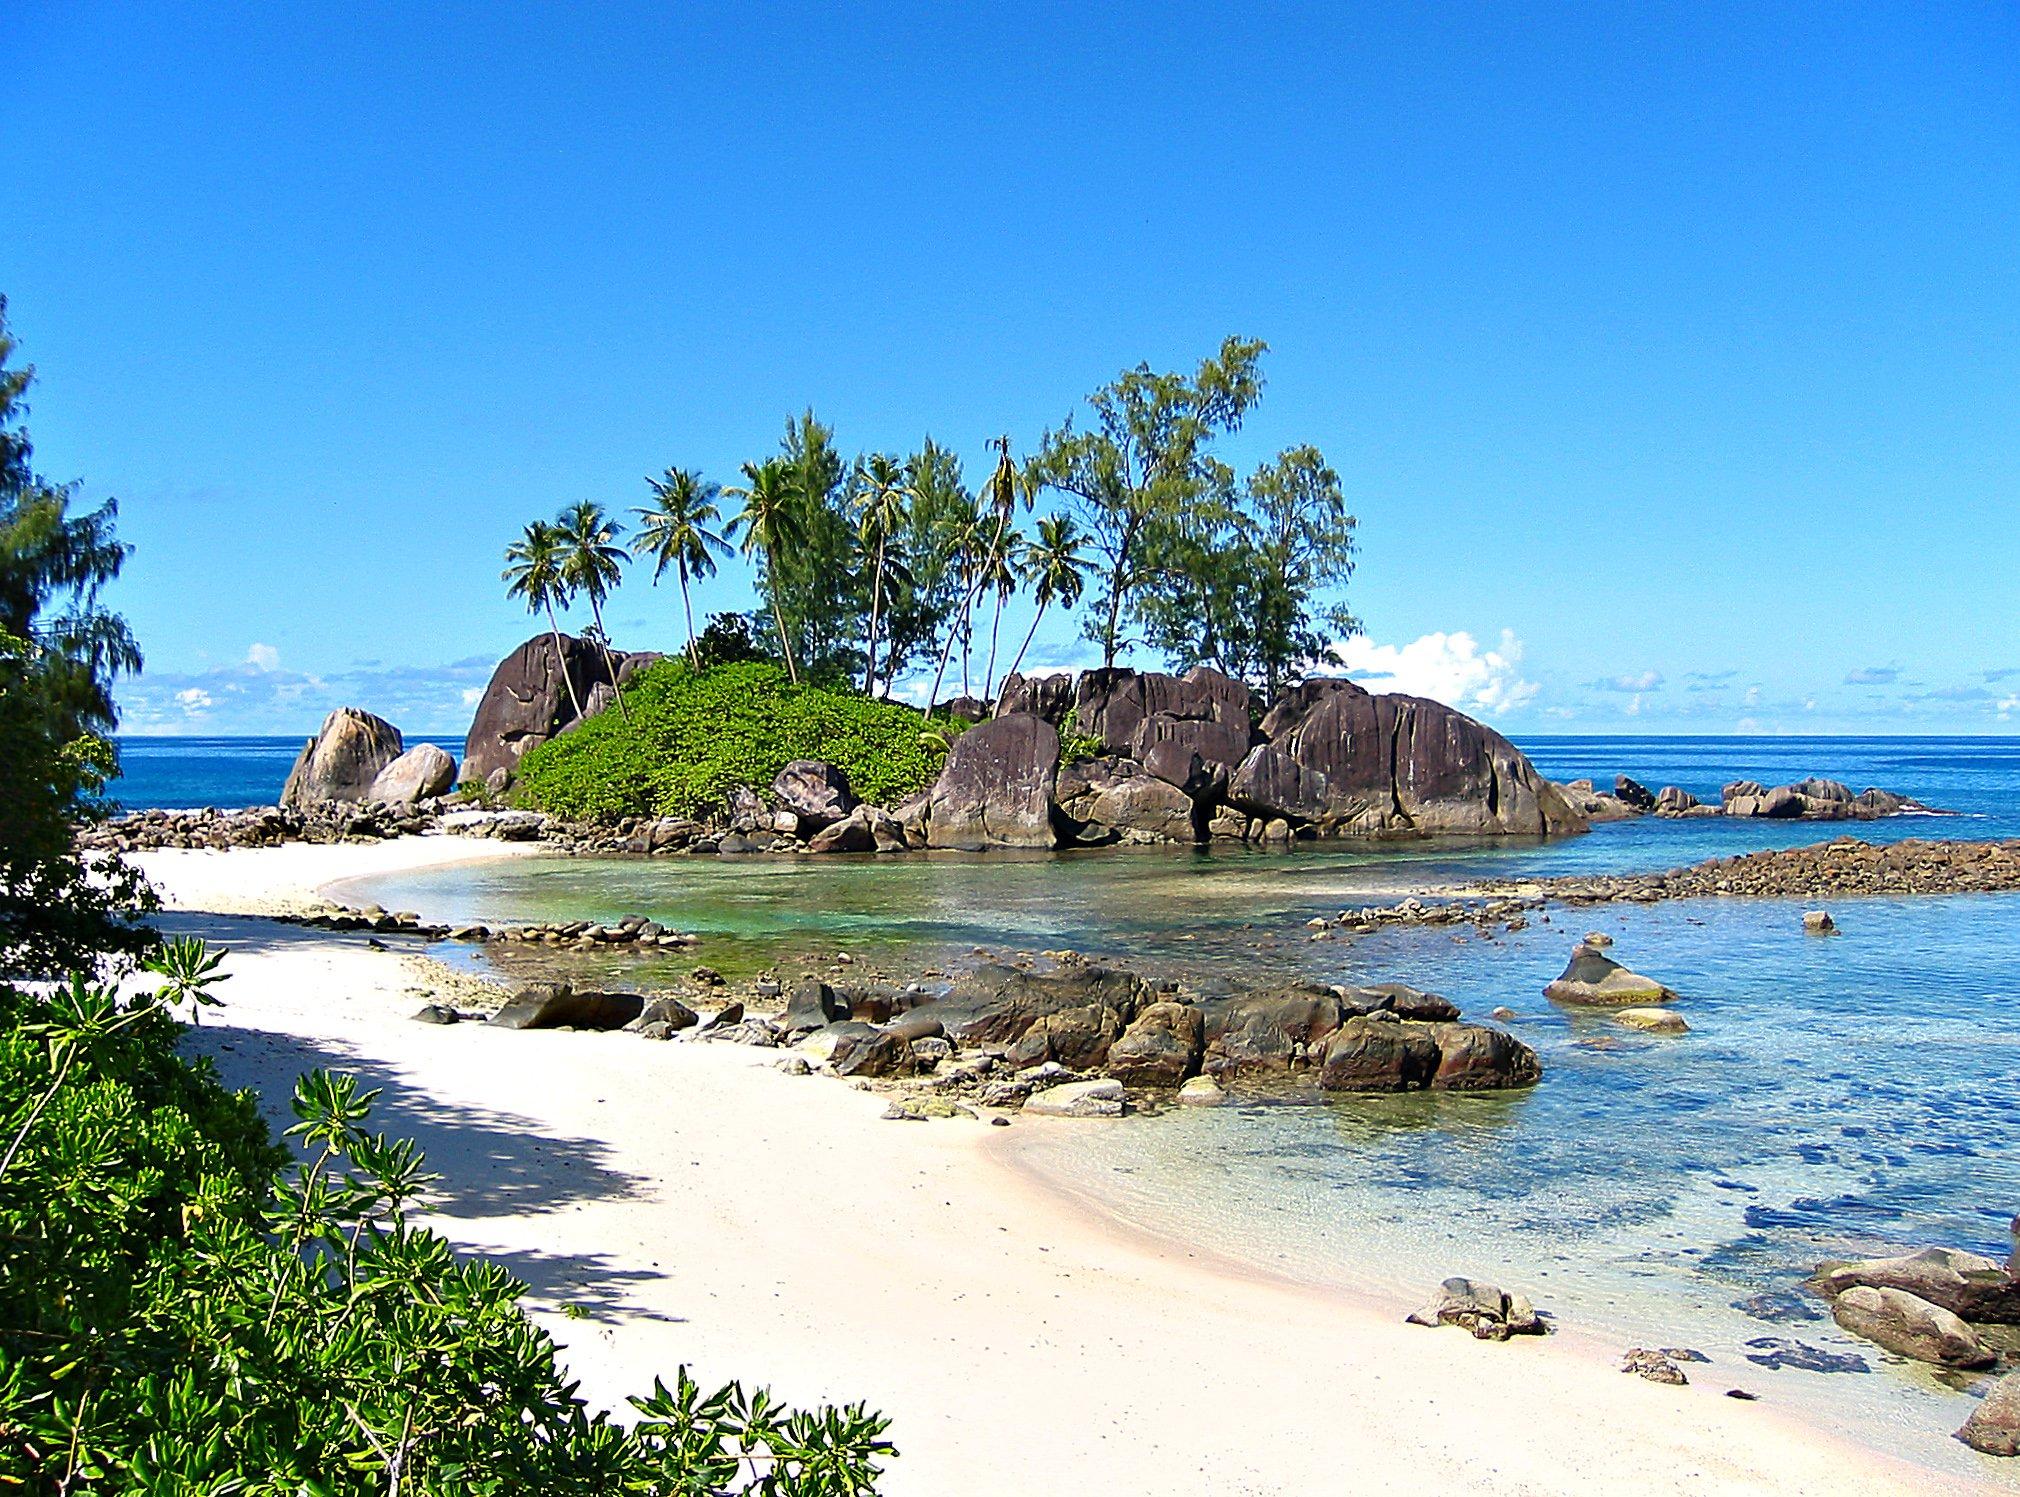 Photo Credit http://commons.wikimedia.org/wiki/File:Seychelles_-_Anse_l'Islette.jpg